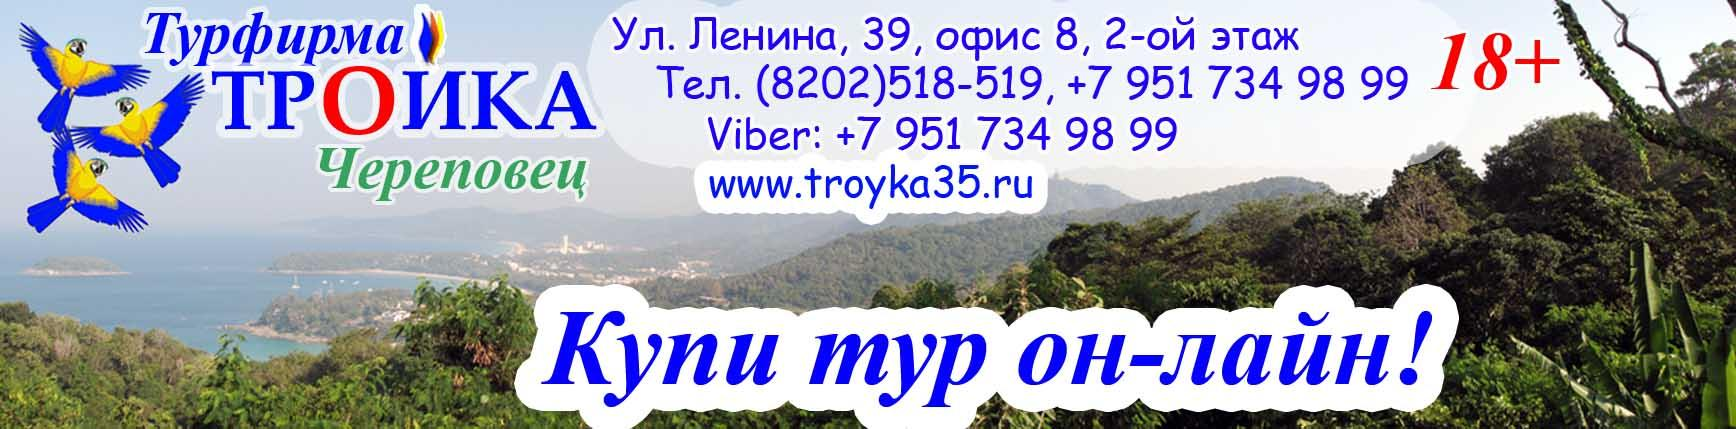 Турфирма Тройка Череповец Вологда Бабаево горячие туры